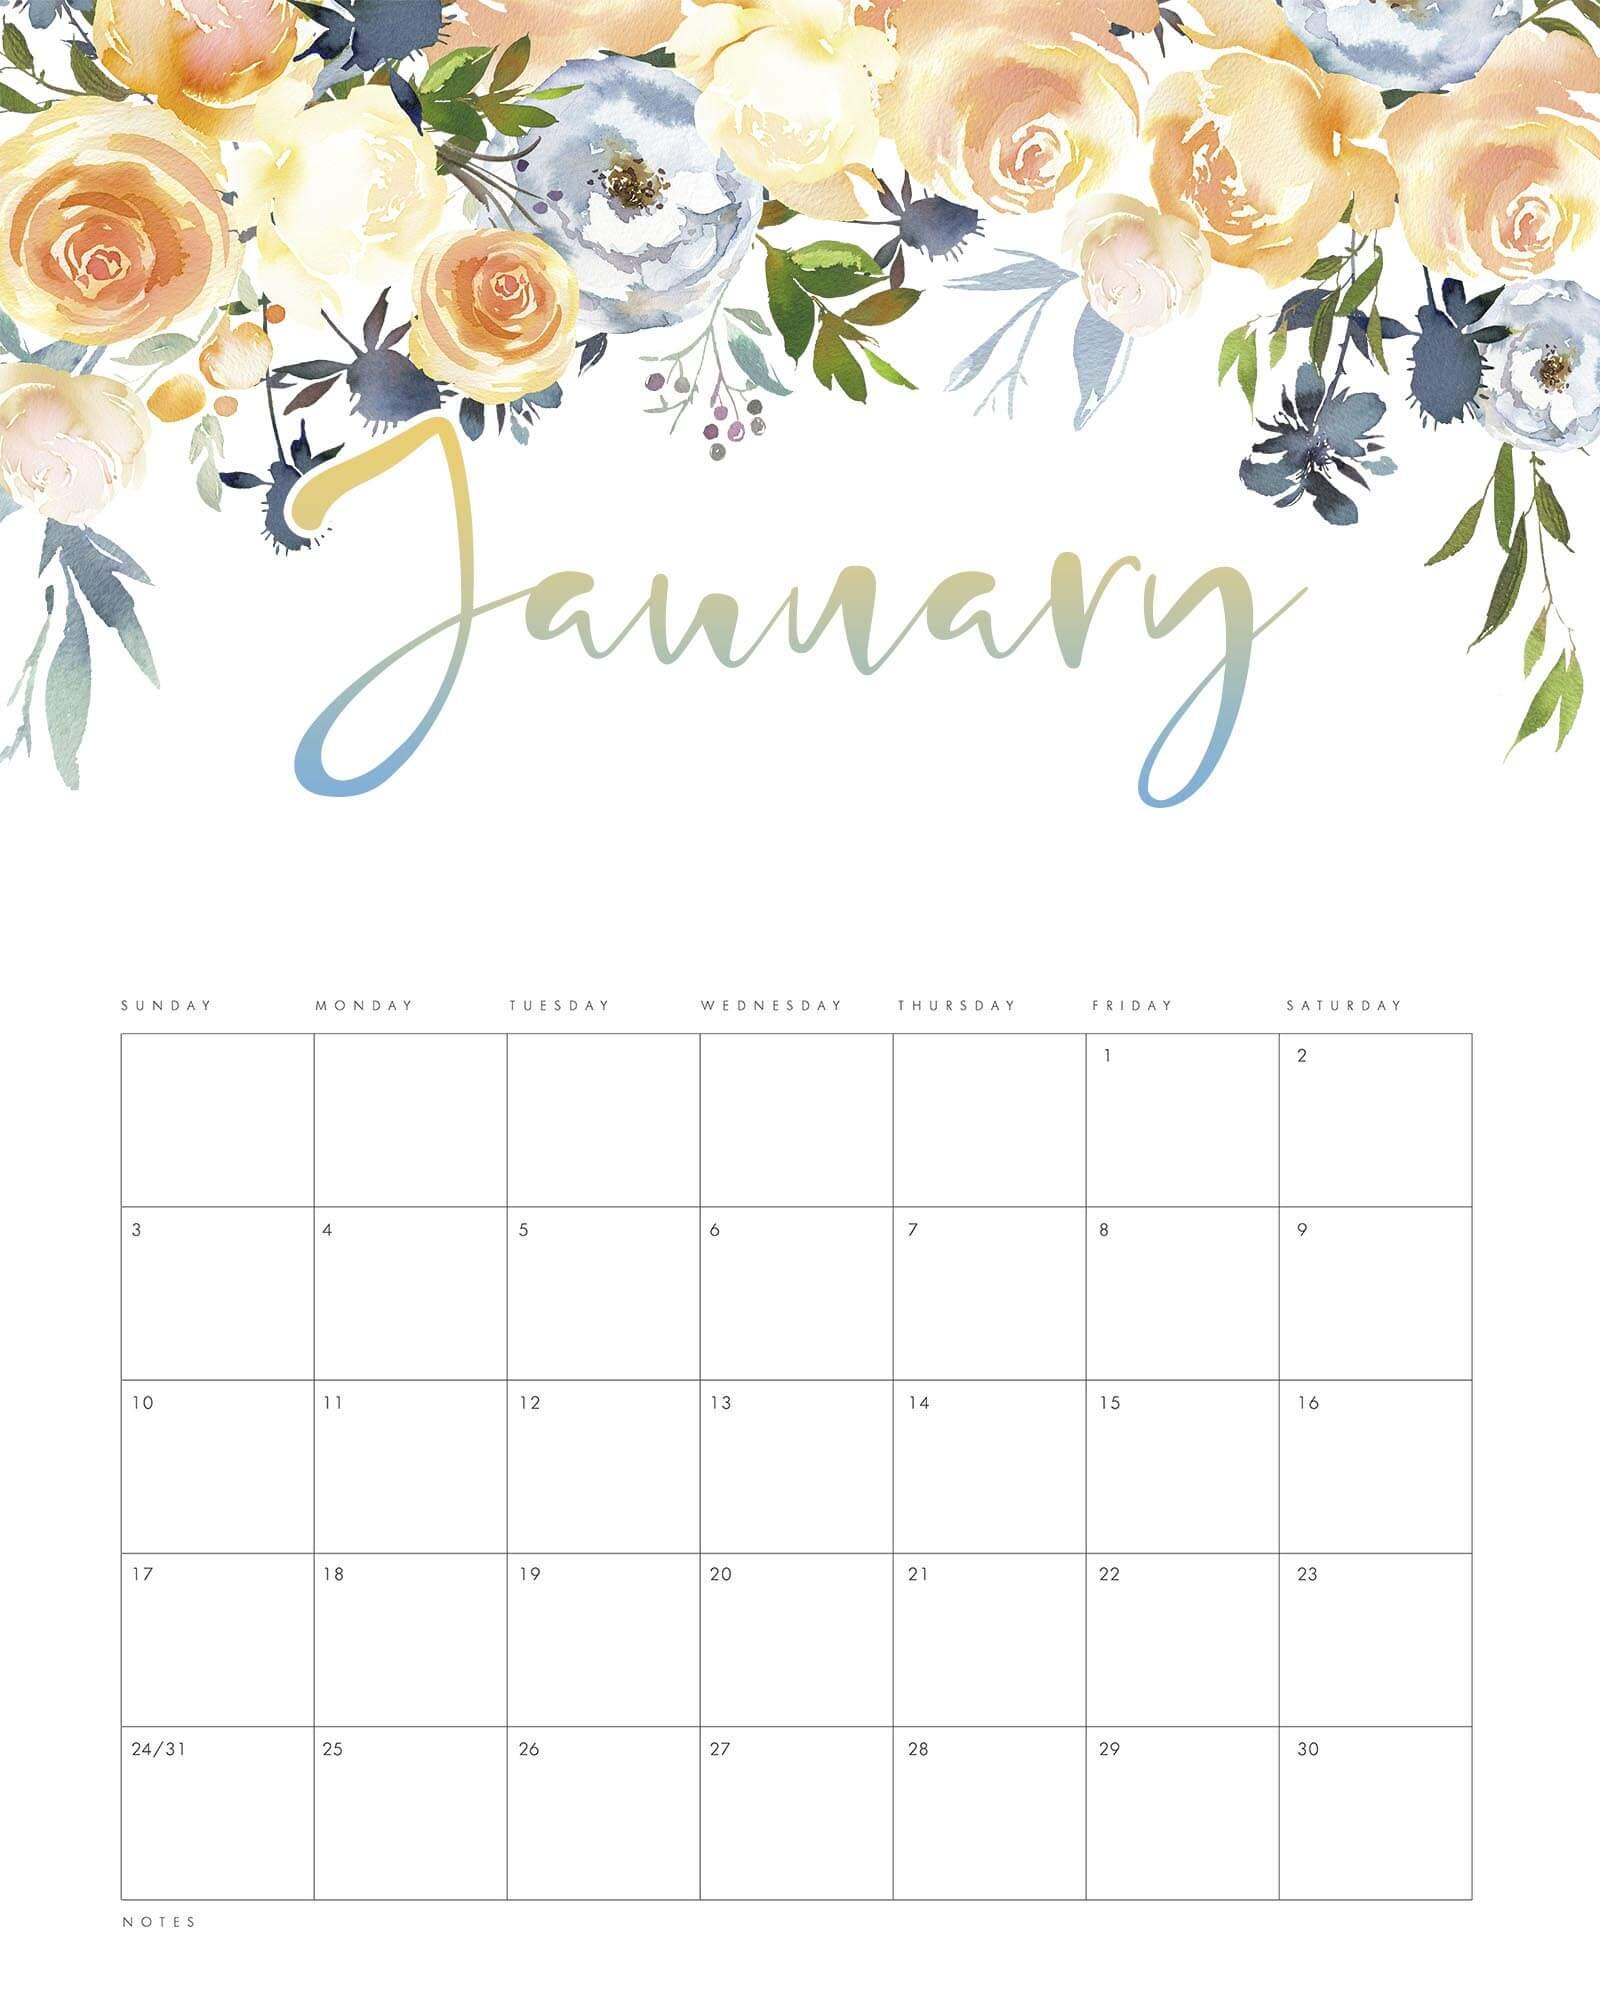 January 2021 Calendar Floral